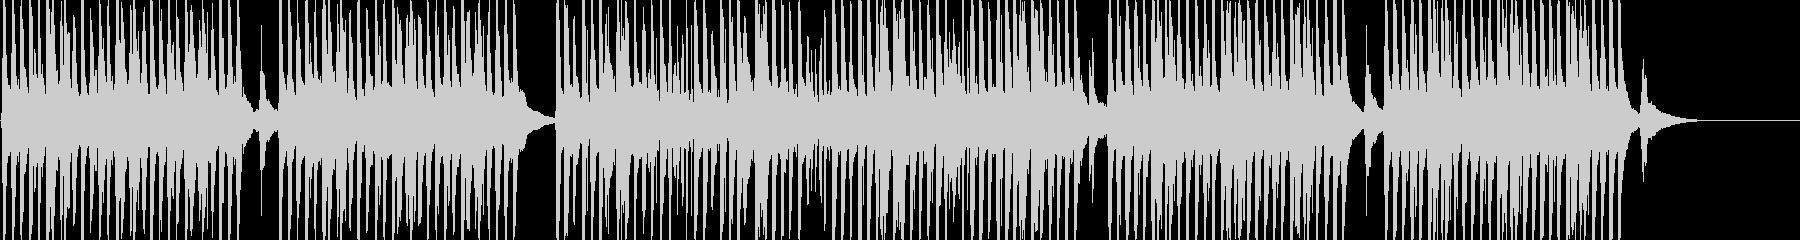 YouTubeに楽しげな口笛&トイピアノの未再生の波形